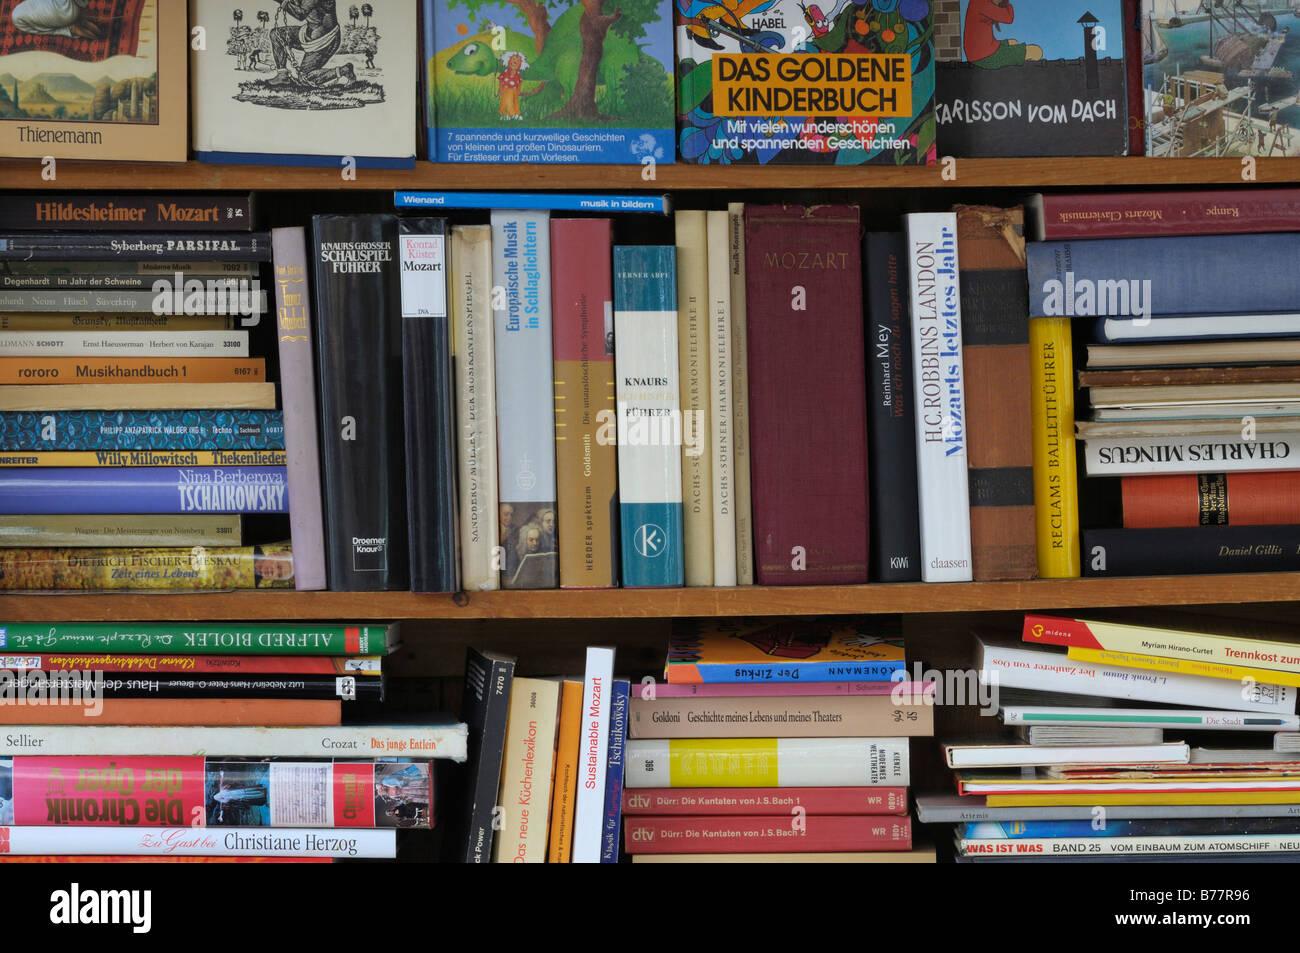 Full book shelves, antiquarian book shop, various topics - Stock Image